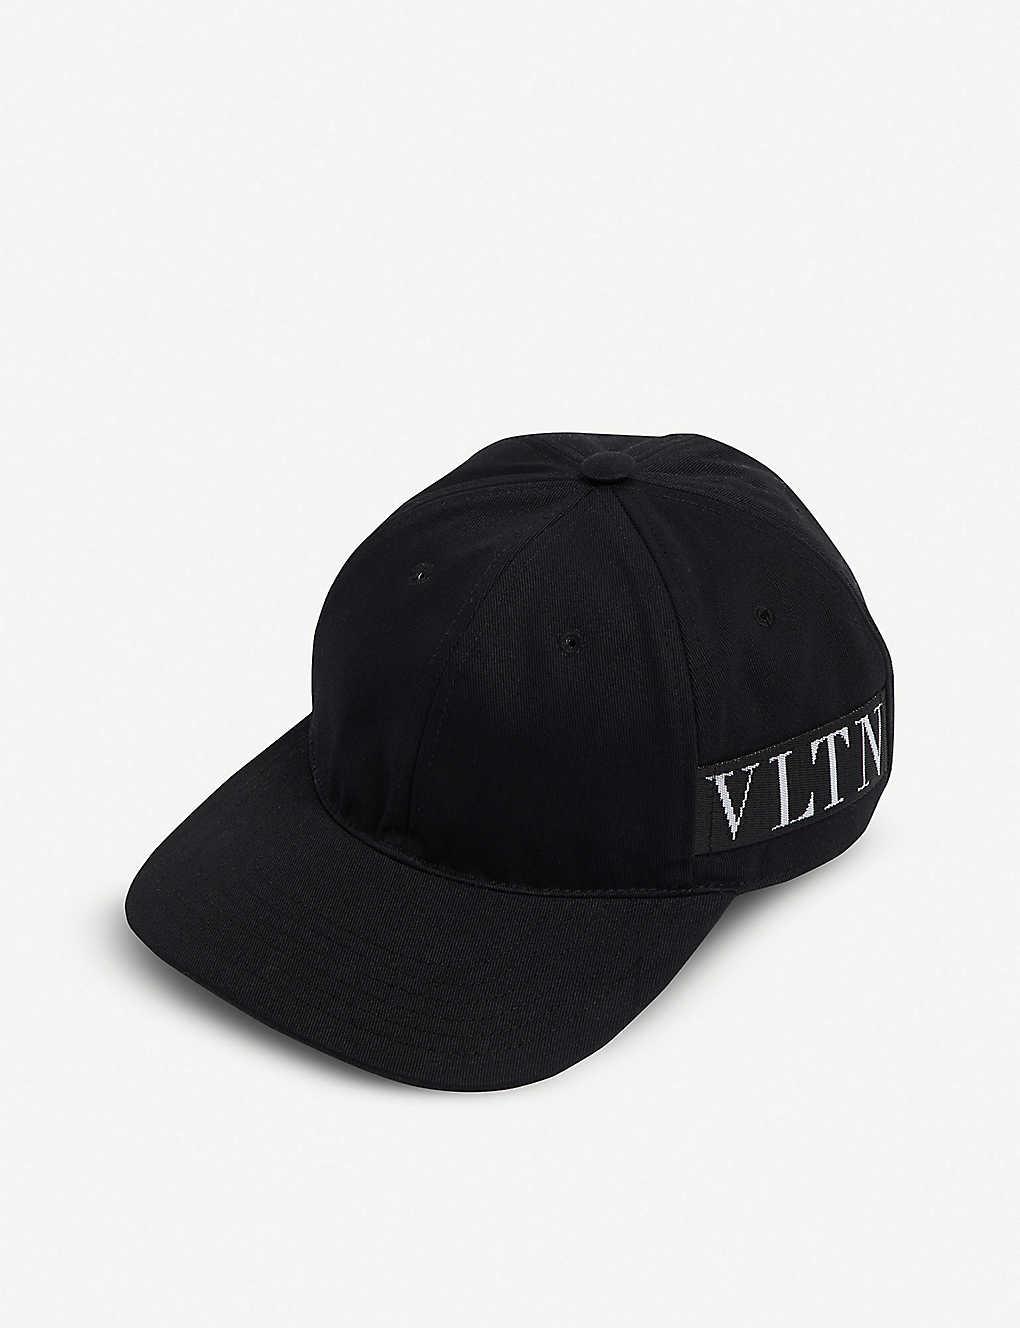 f9e7b75ded4 VALENTINO - VLTN baseball cap